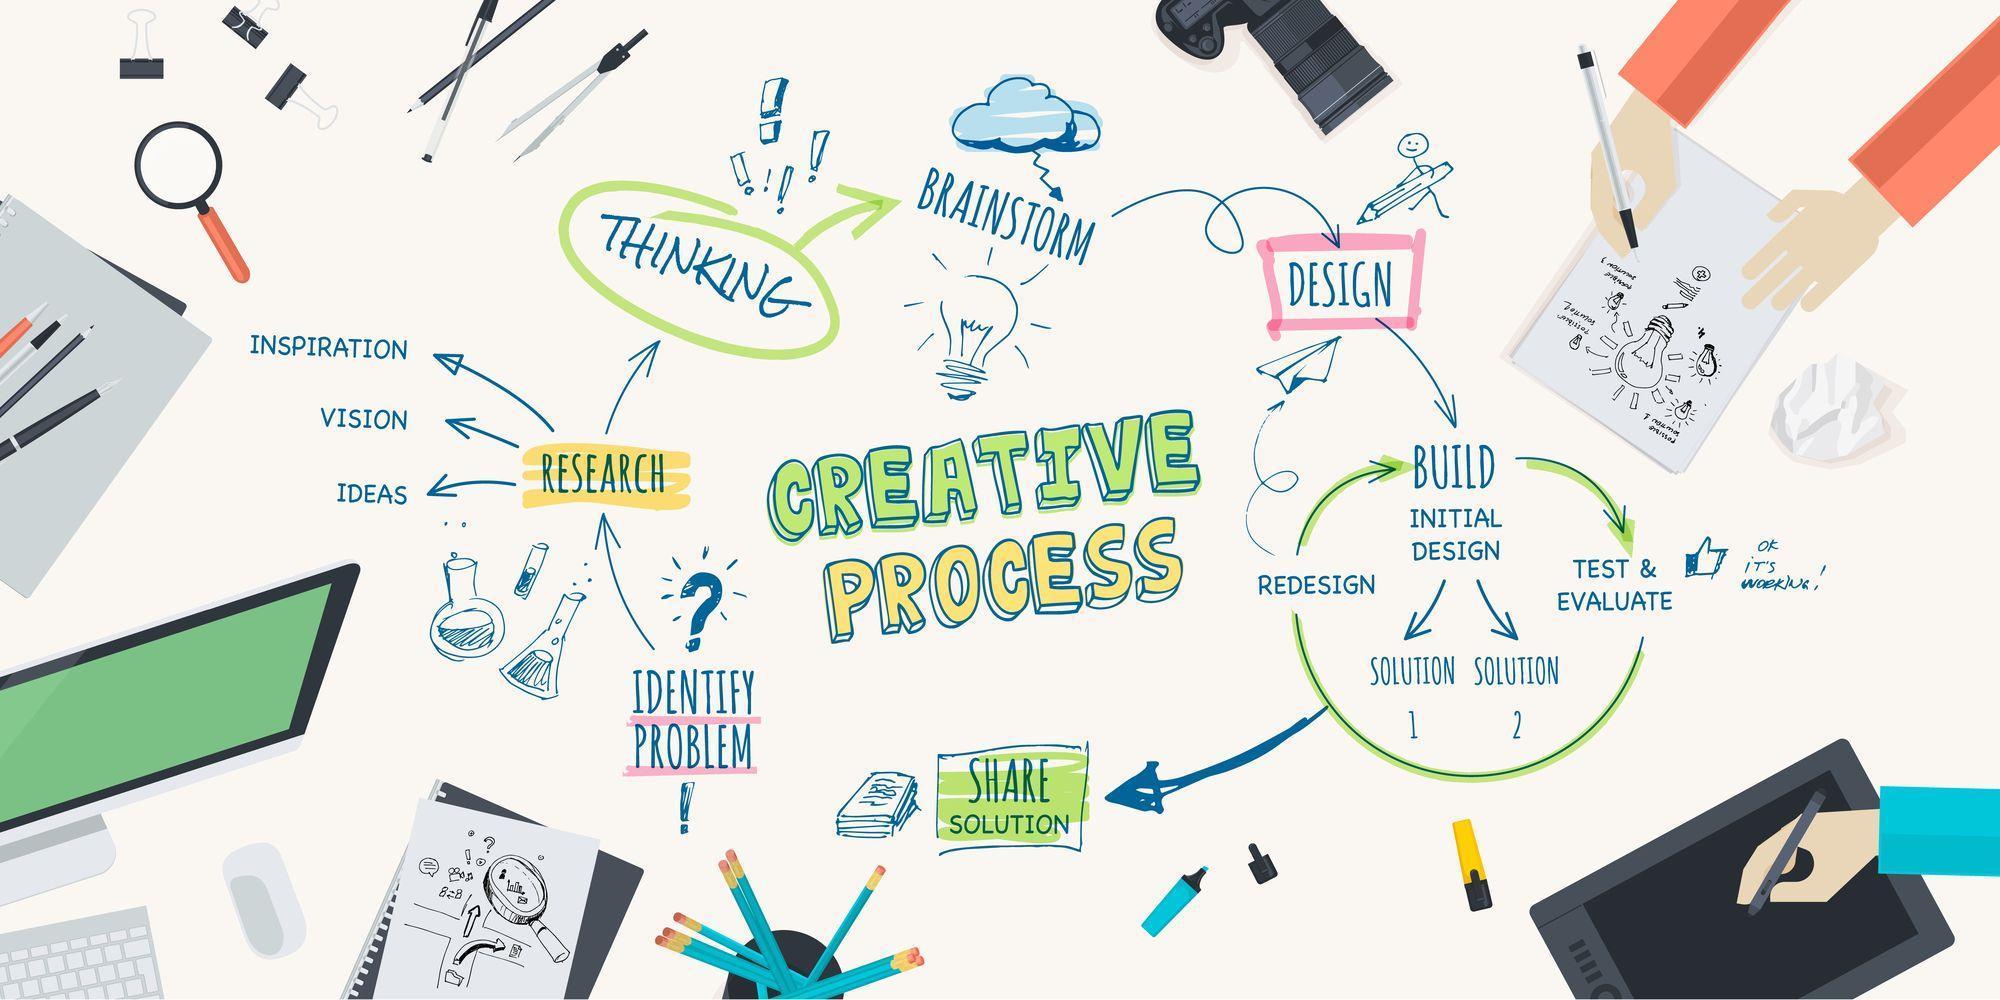 G:\ARTIKEL INDO\SEPTEMBER 2021\SUSAN PROJECT\Ideoworks September 2021\Ideoworks September 2021 - Minggu 3\Ideoworks\Creative Agency Jakarta 4.jpg